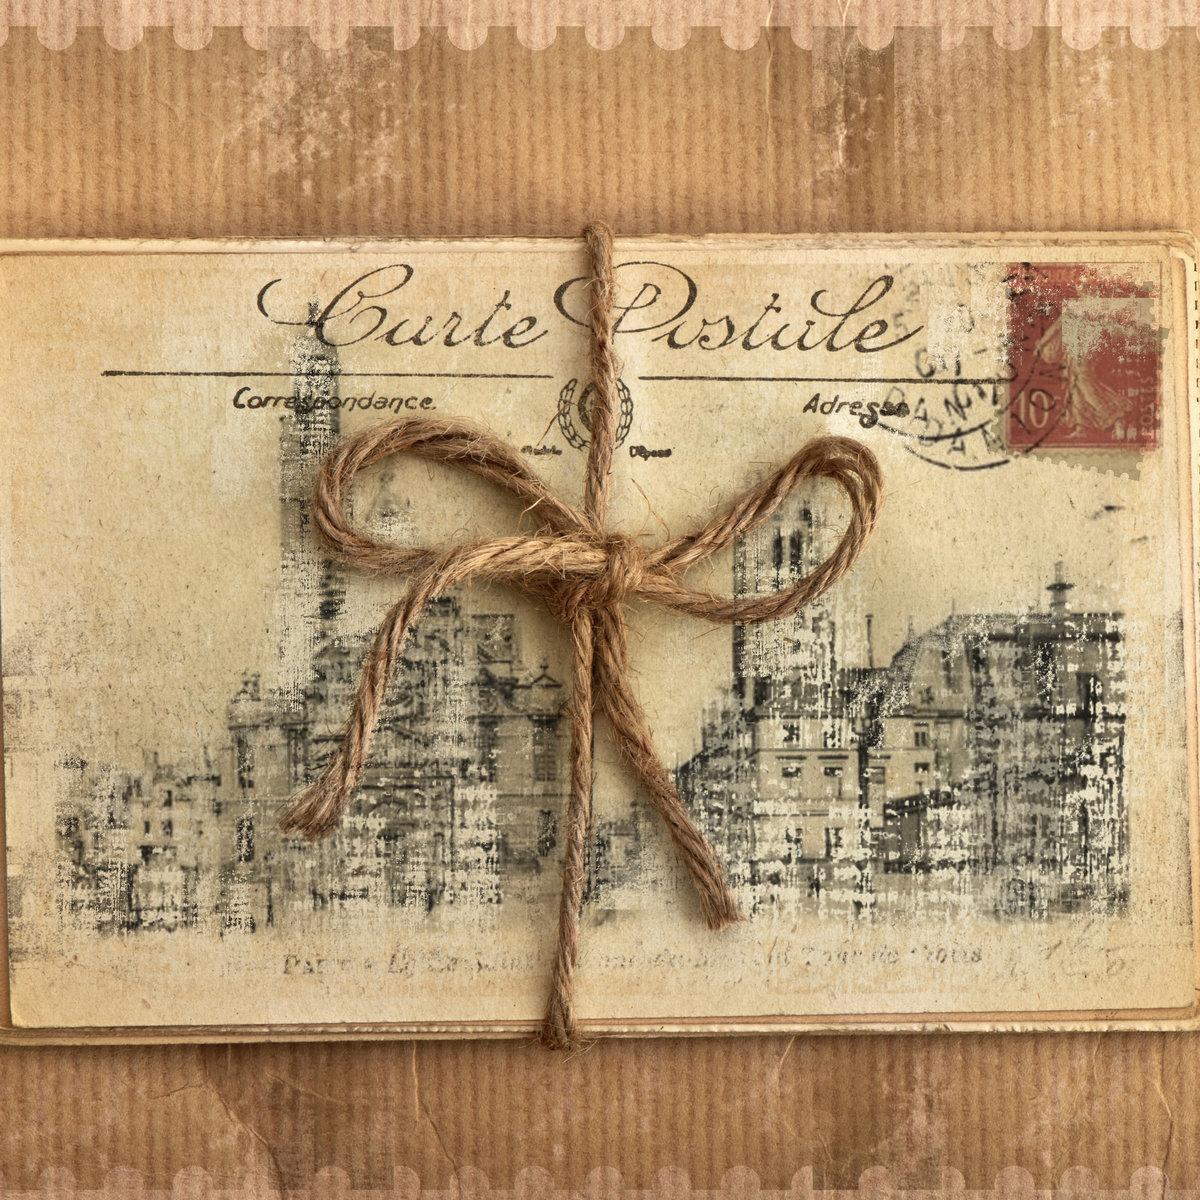 Внучкой бабушке, картинки открытки в стиле винтаж